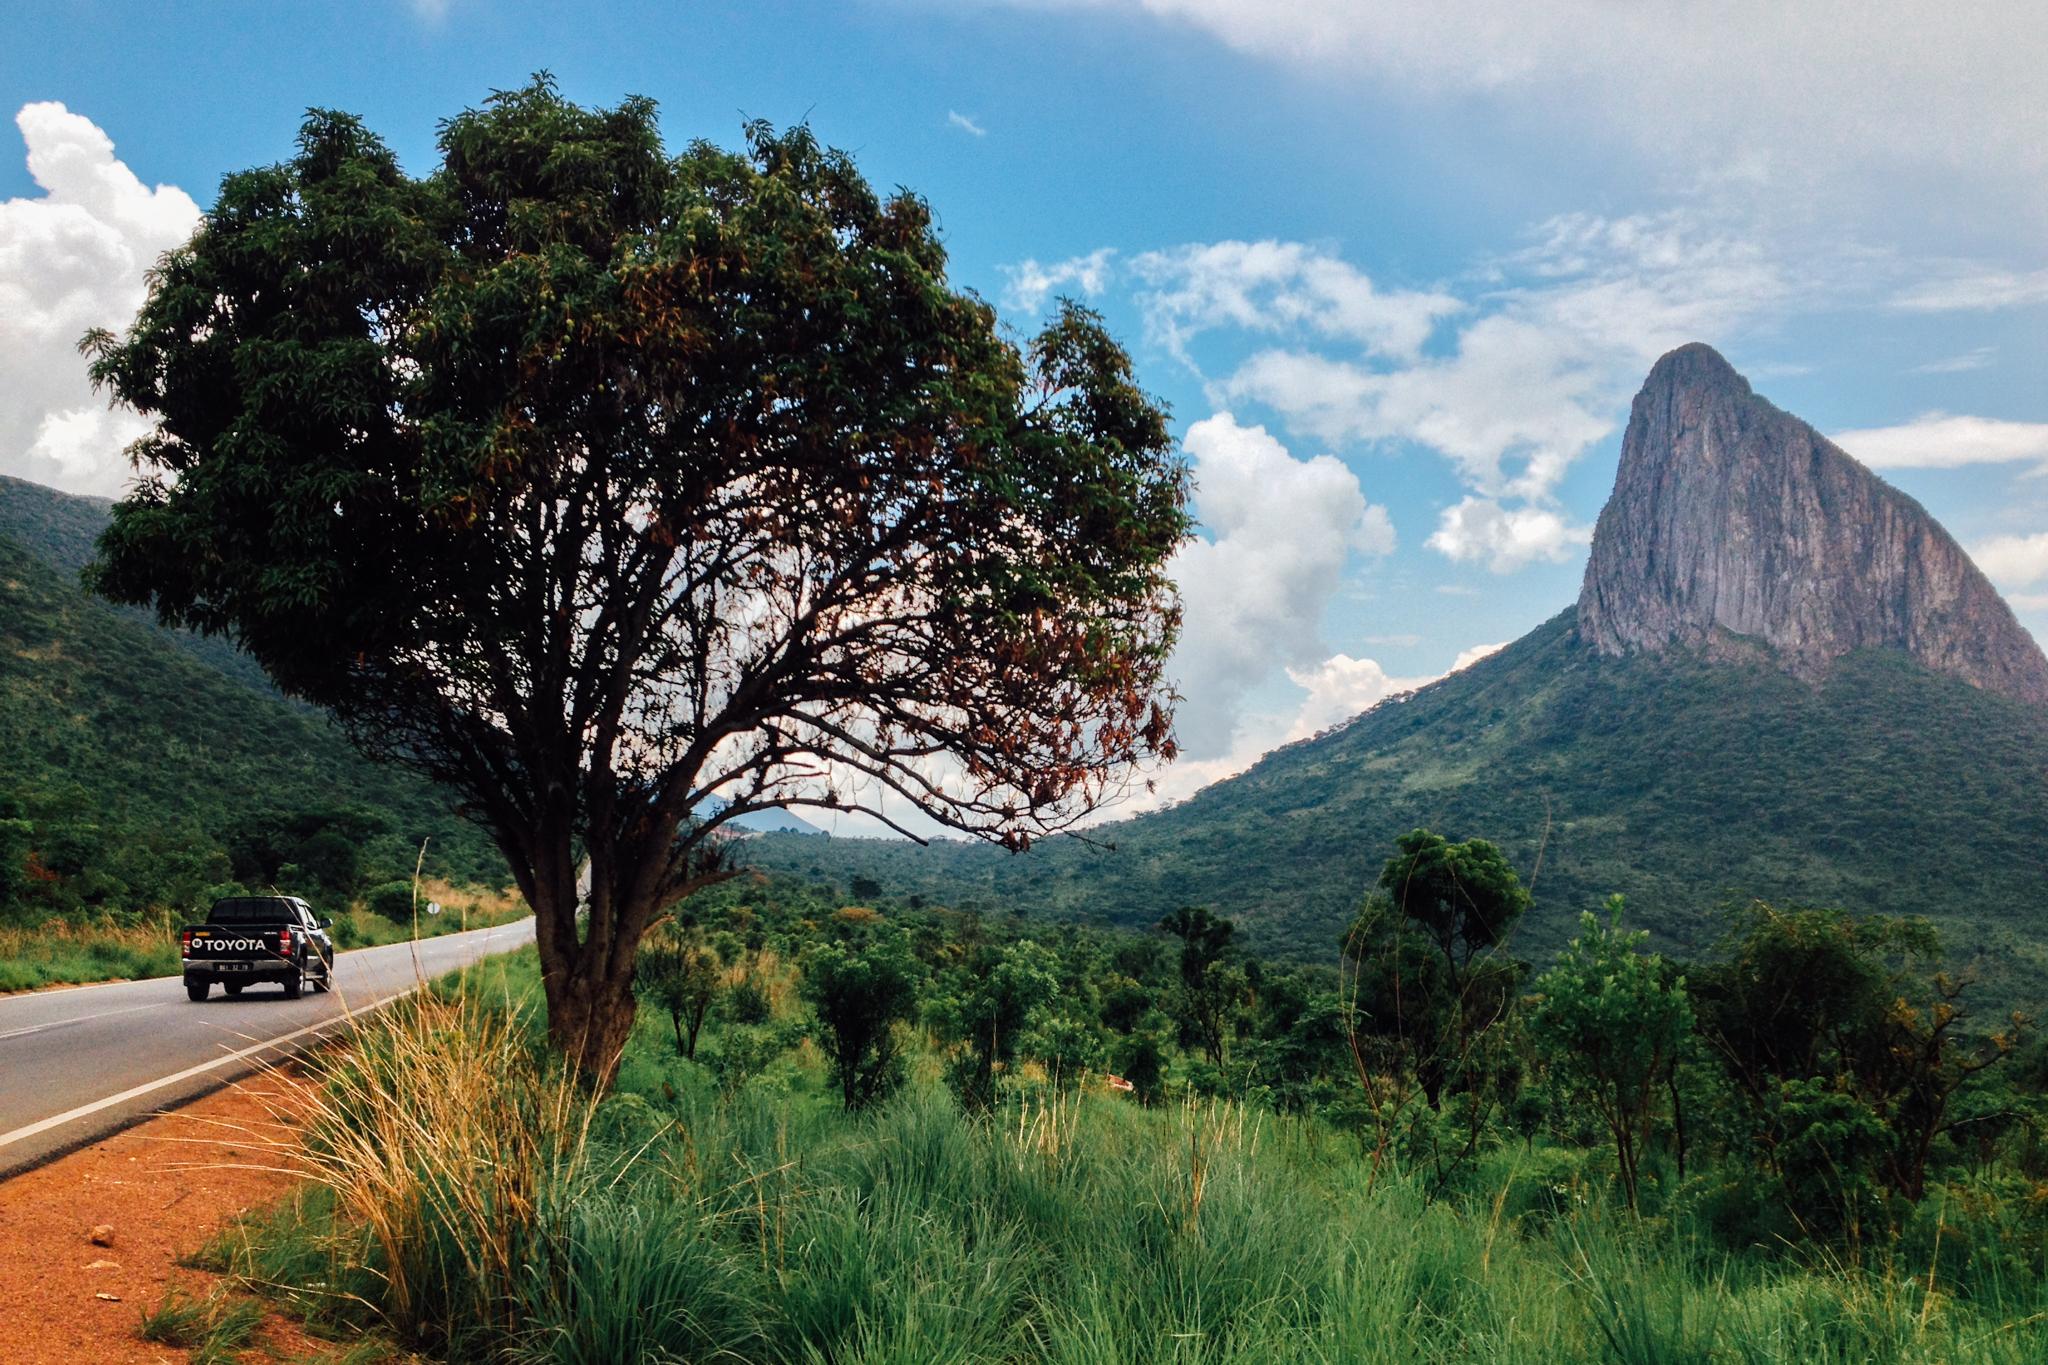 [2014] iPhone 4S - Huambo province, Angola